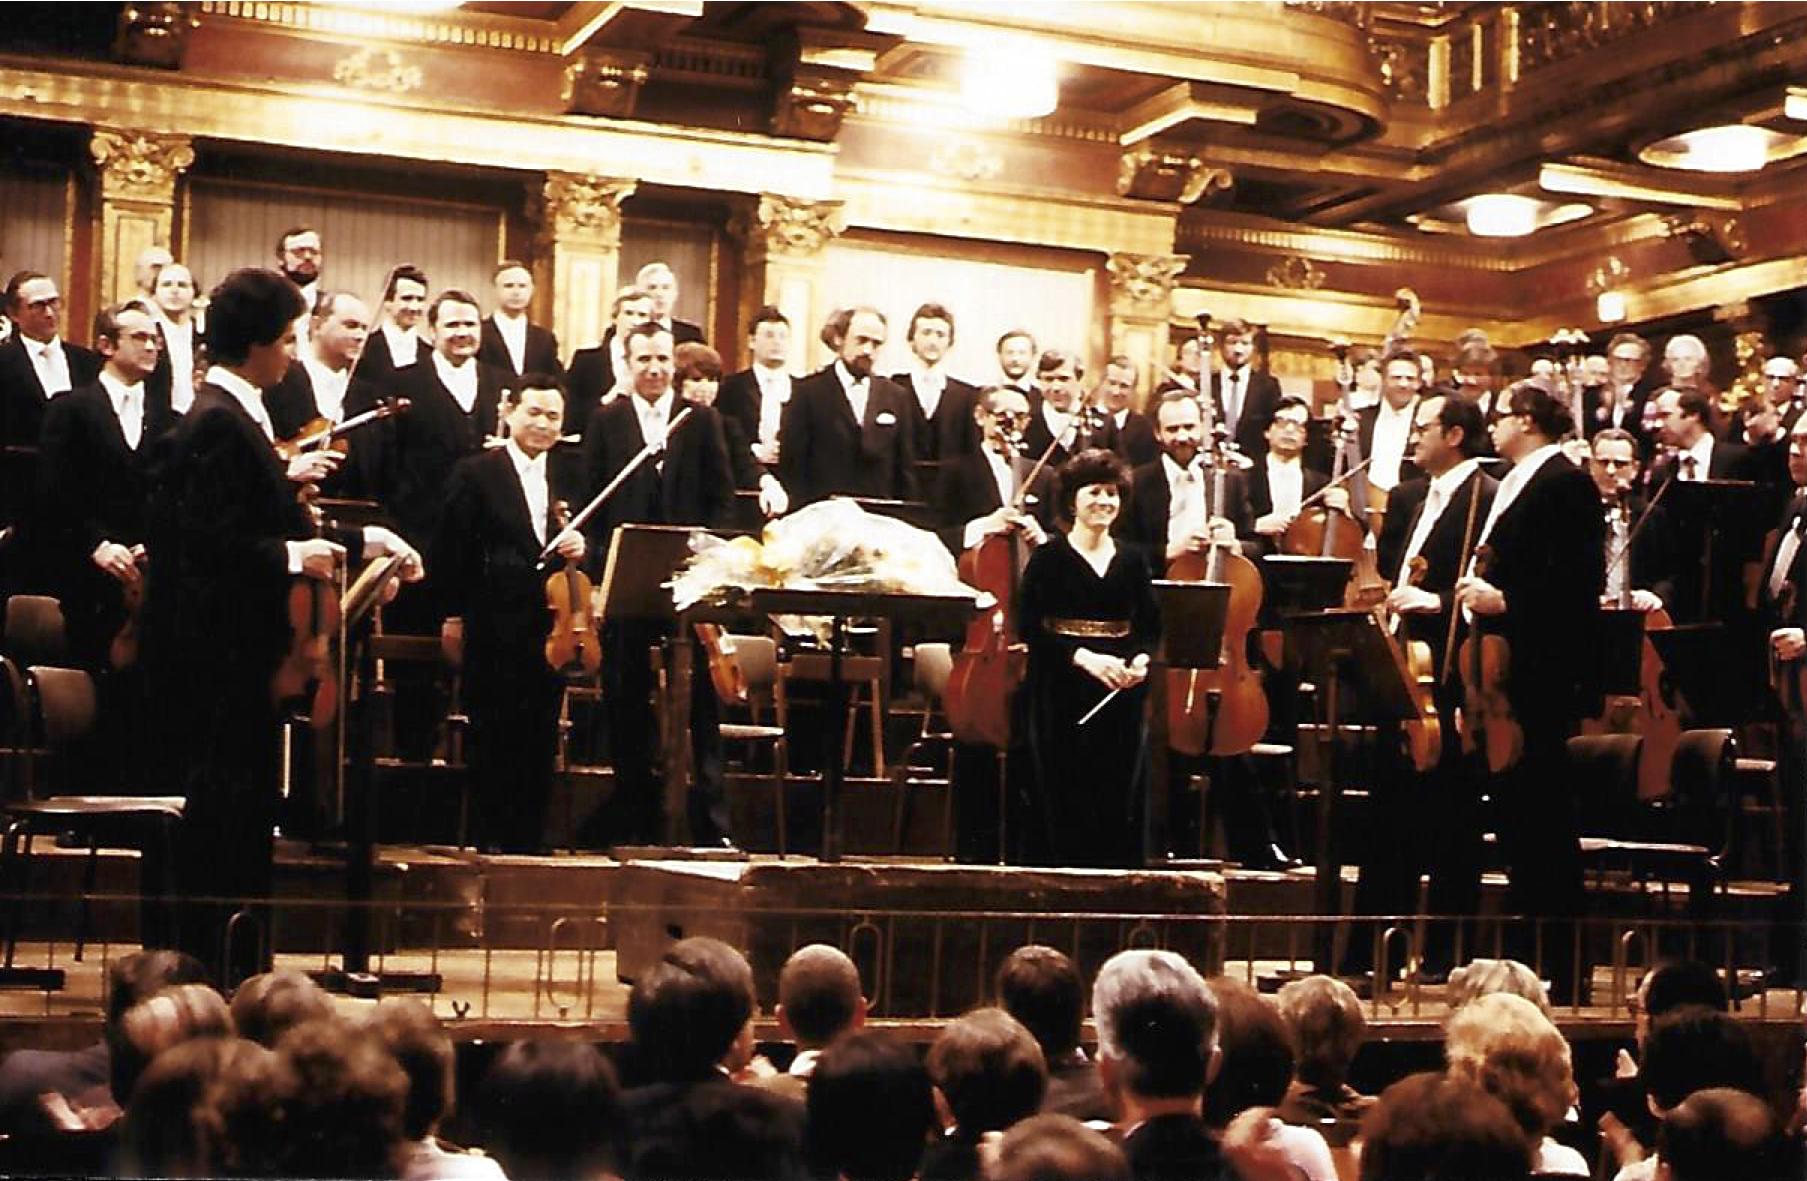 Tonkunstler Orchester at Grosser Musikvereinsaal, Vienna